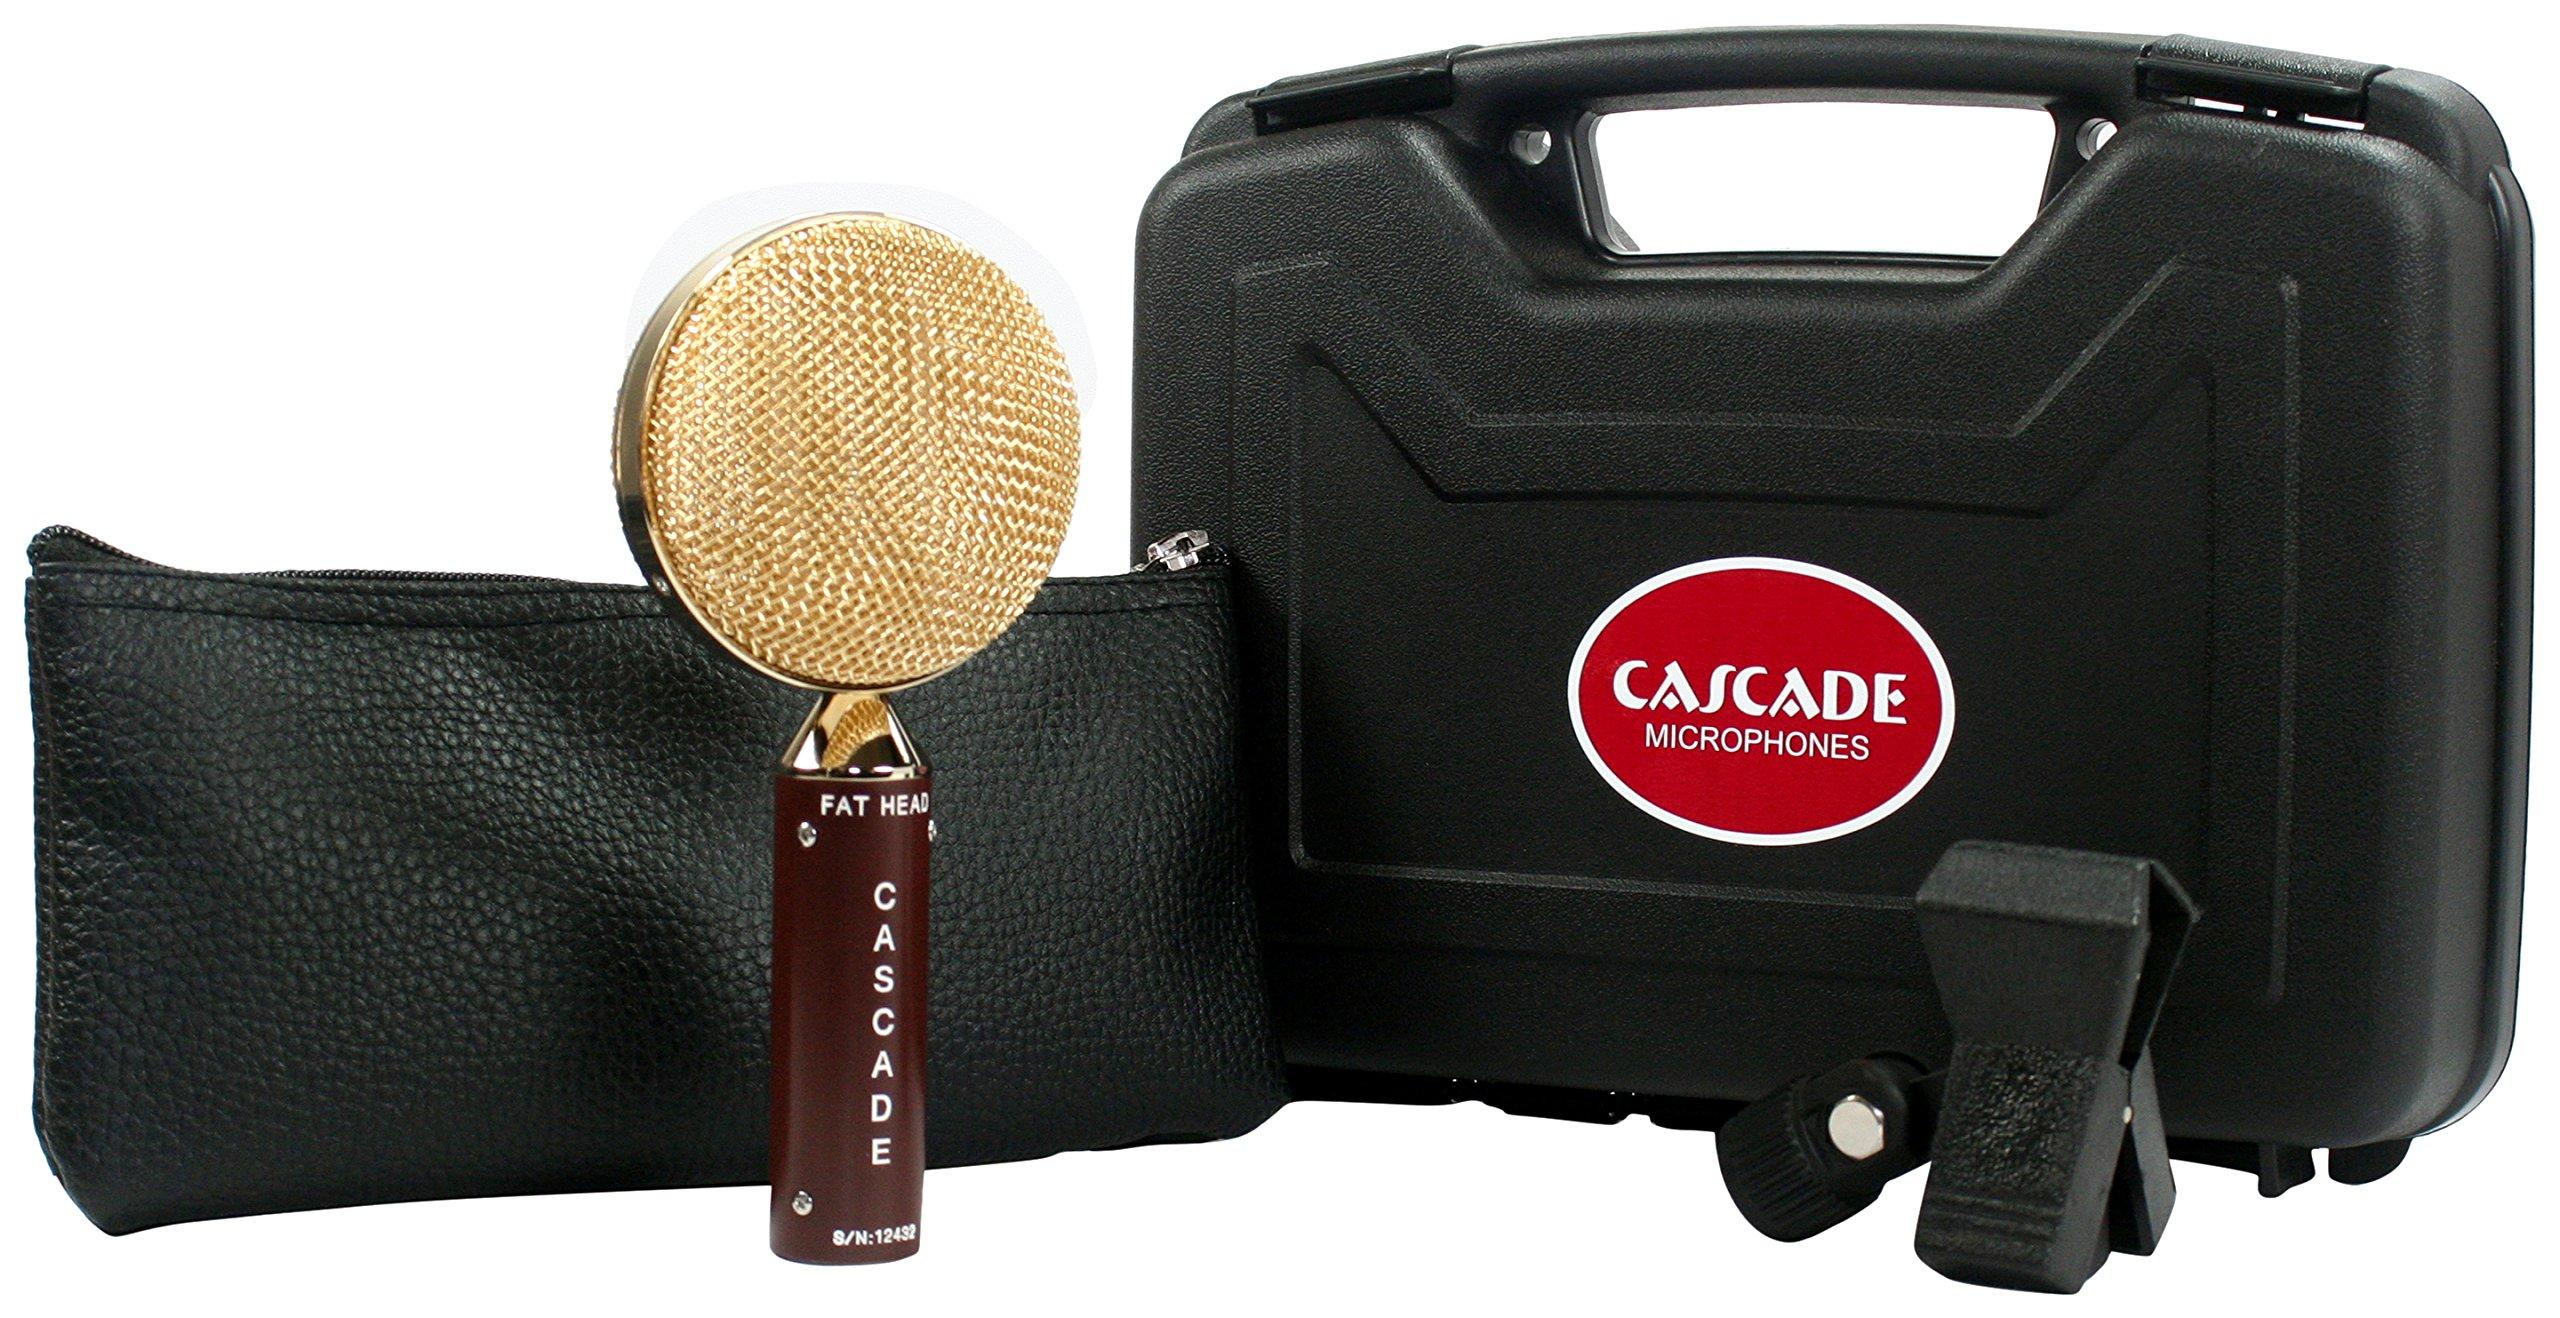 Cascade Microphones 98-G-A FAT HEAD Ribbon Microphone, Brown Body/Gold Grill by Cascade Microphones